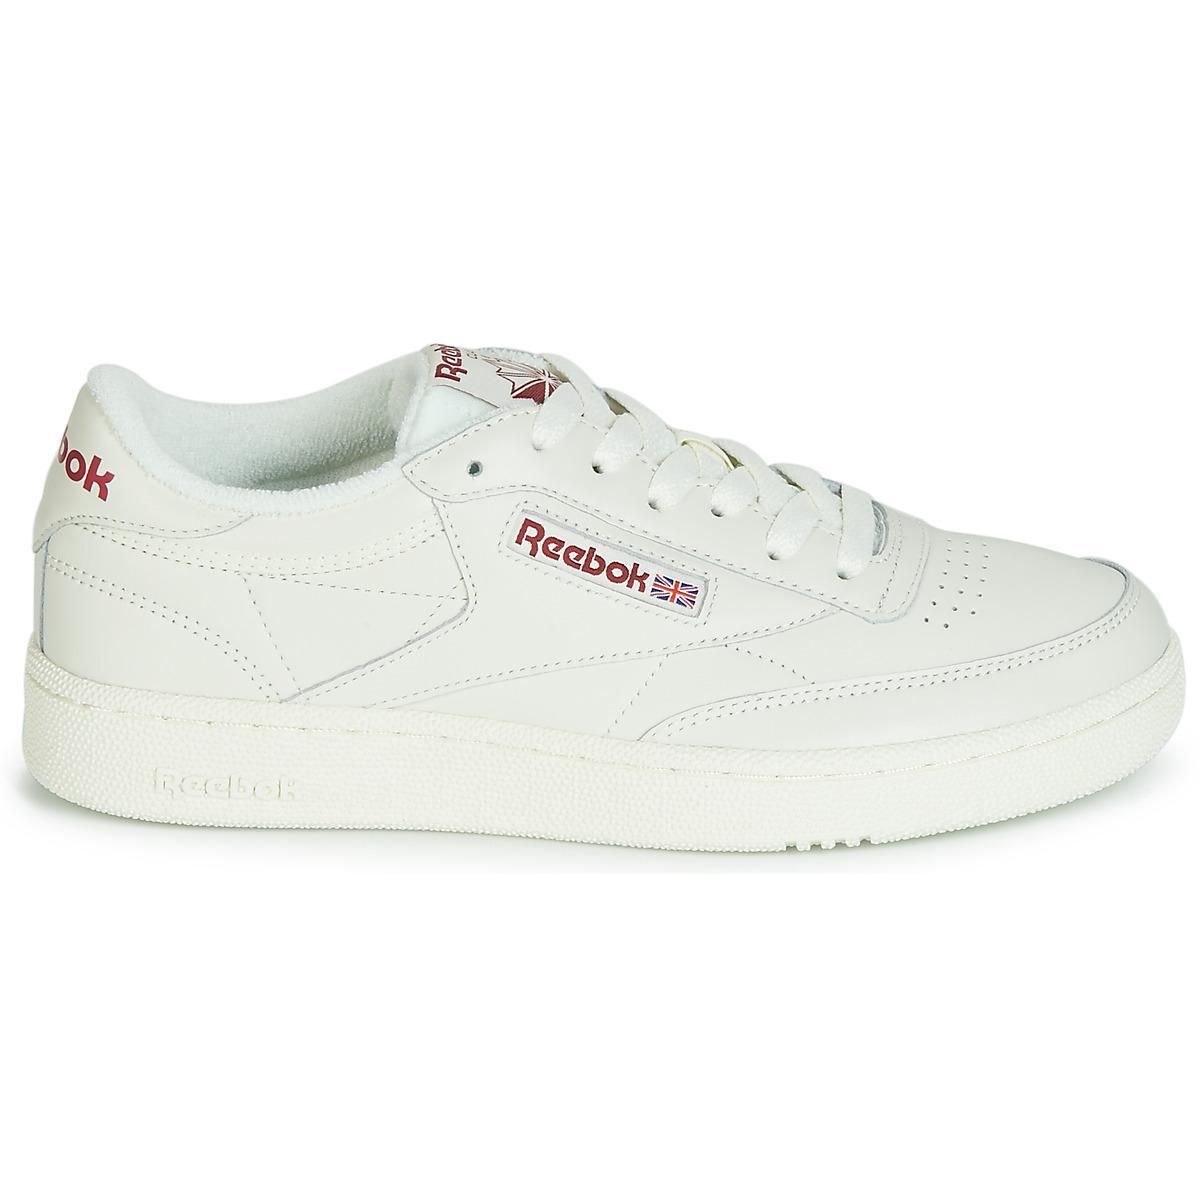 8716427245c Reebok - Natural Club C 85 Mu Men s Shoes (trainers) In Beige for Men. View  fullscreen